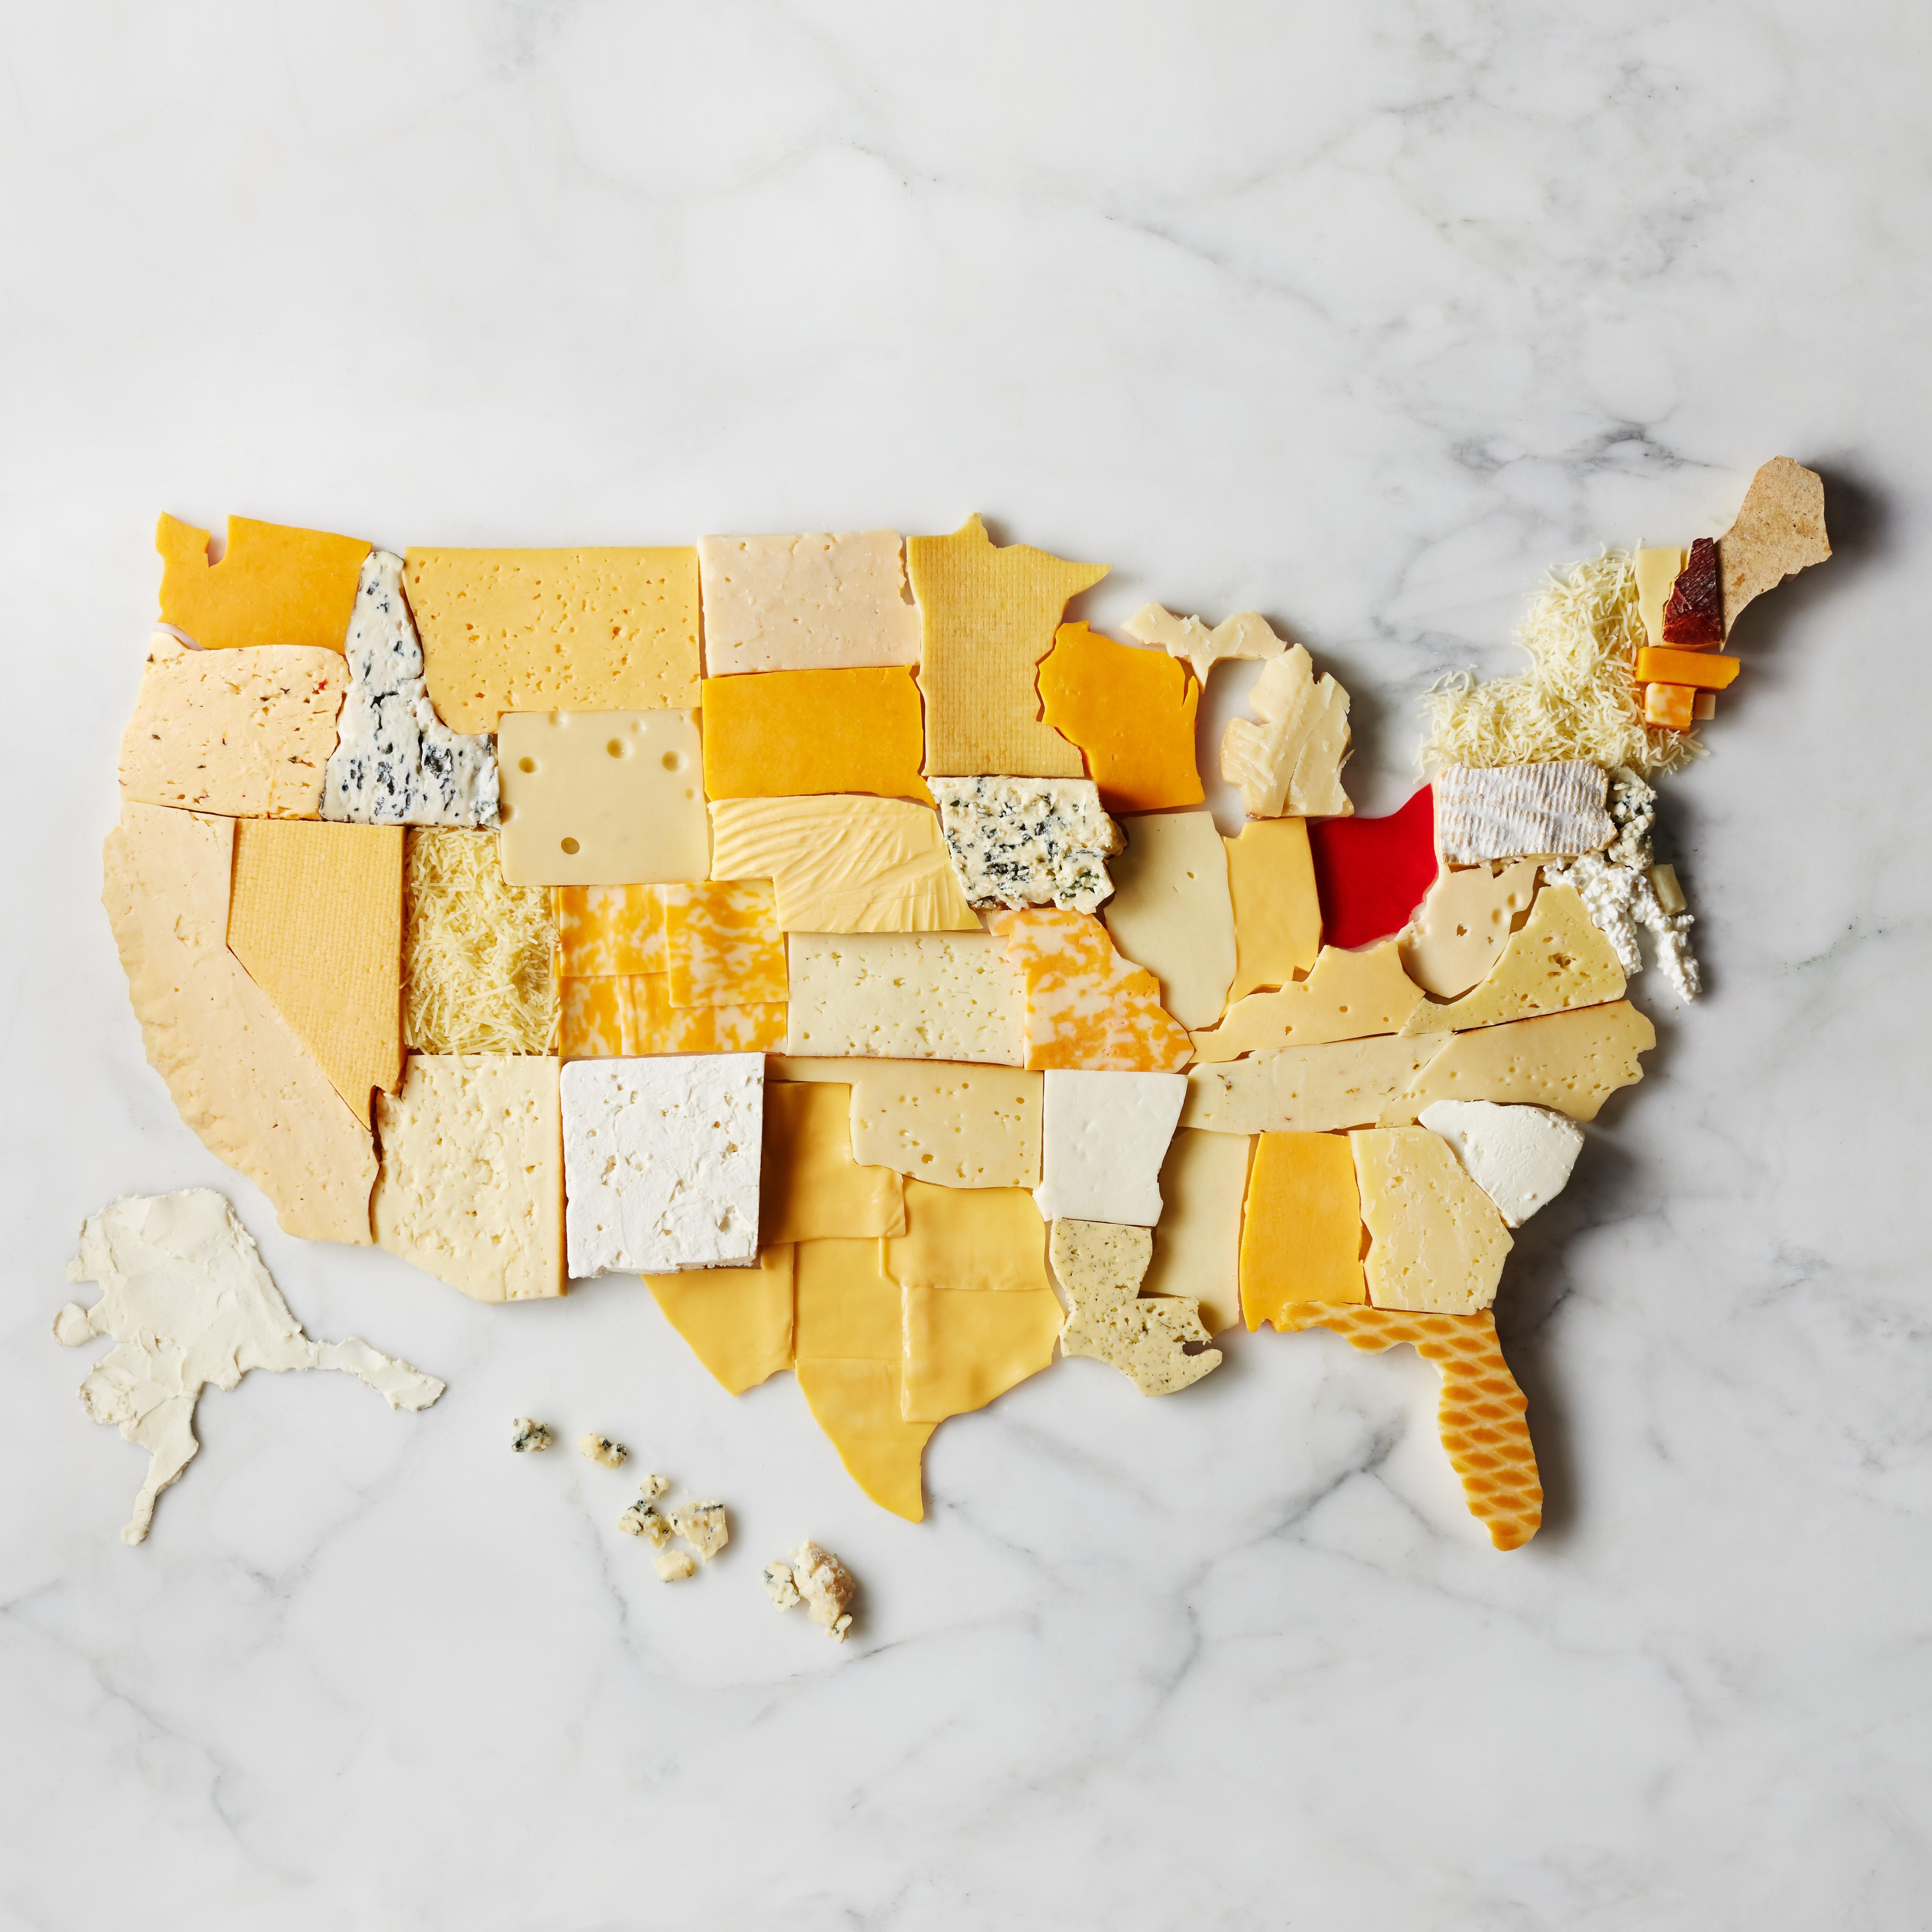 USDEC_Cheese_CheeseMap